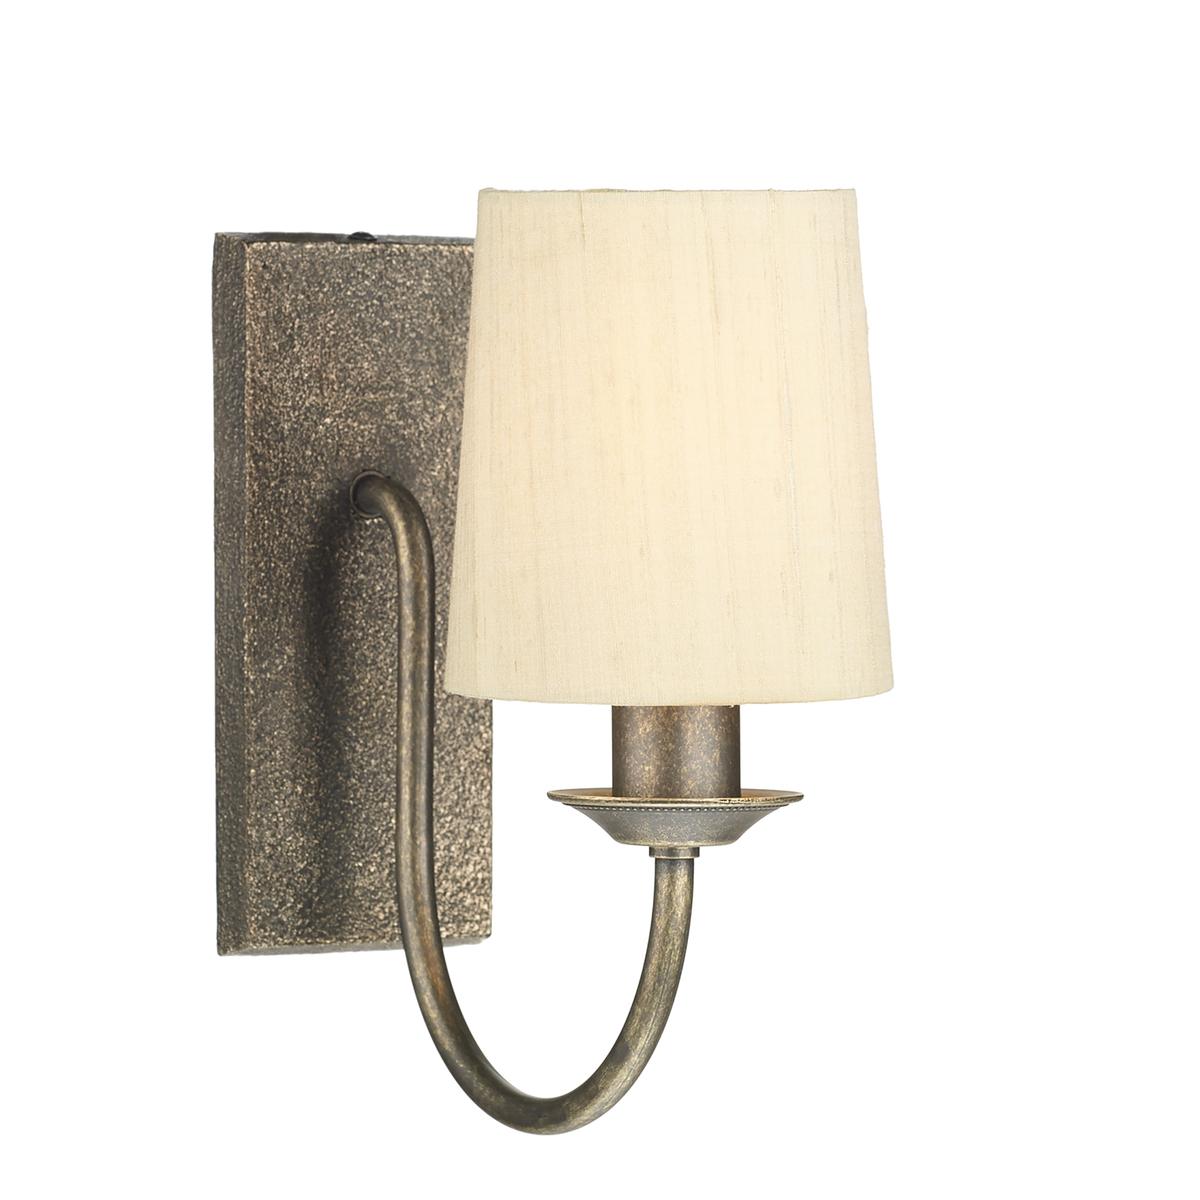 Herriot Single Wall Light